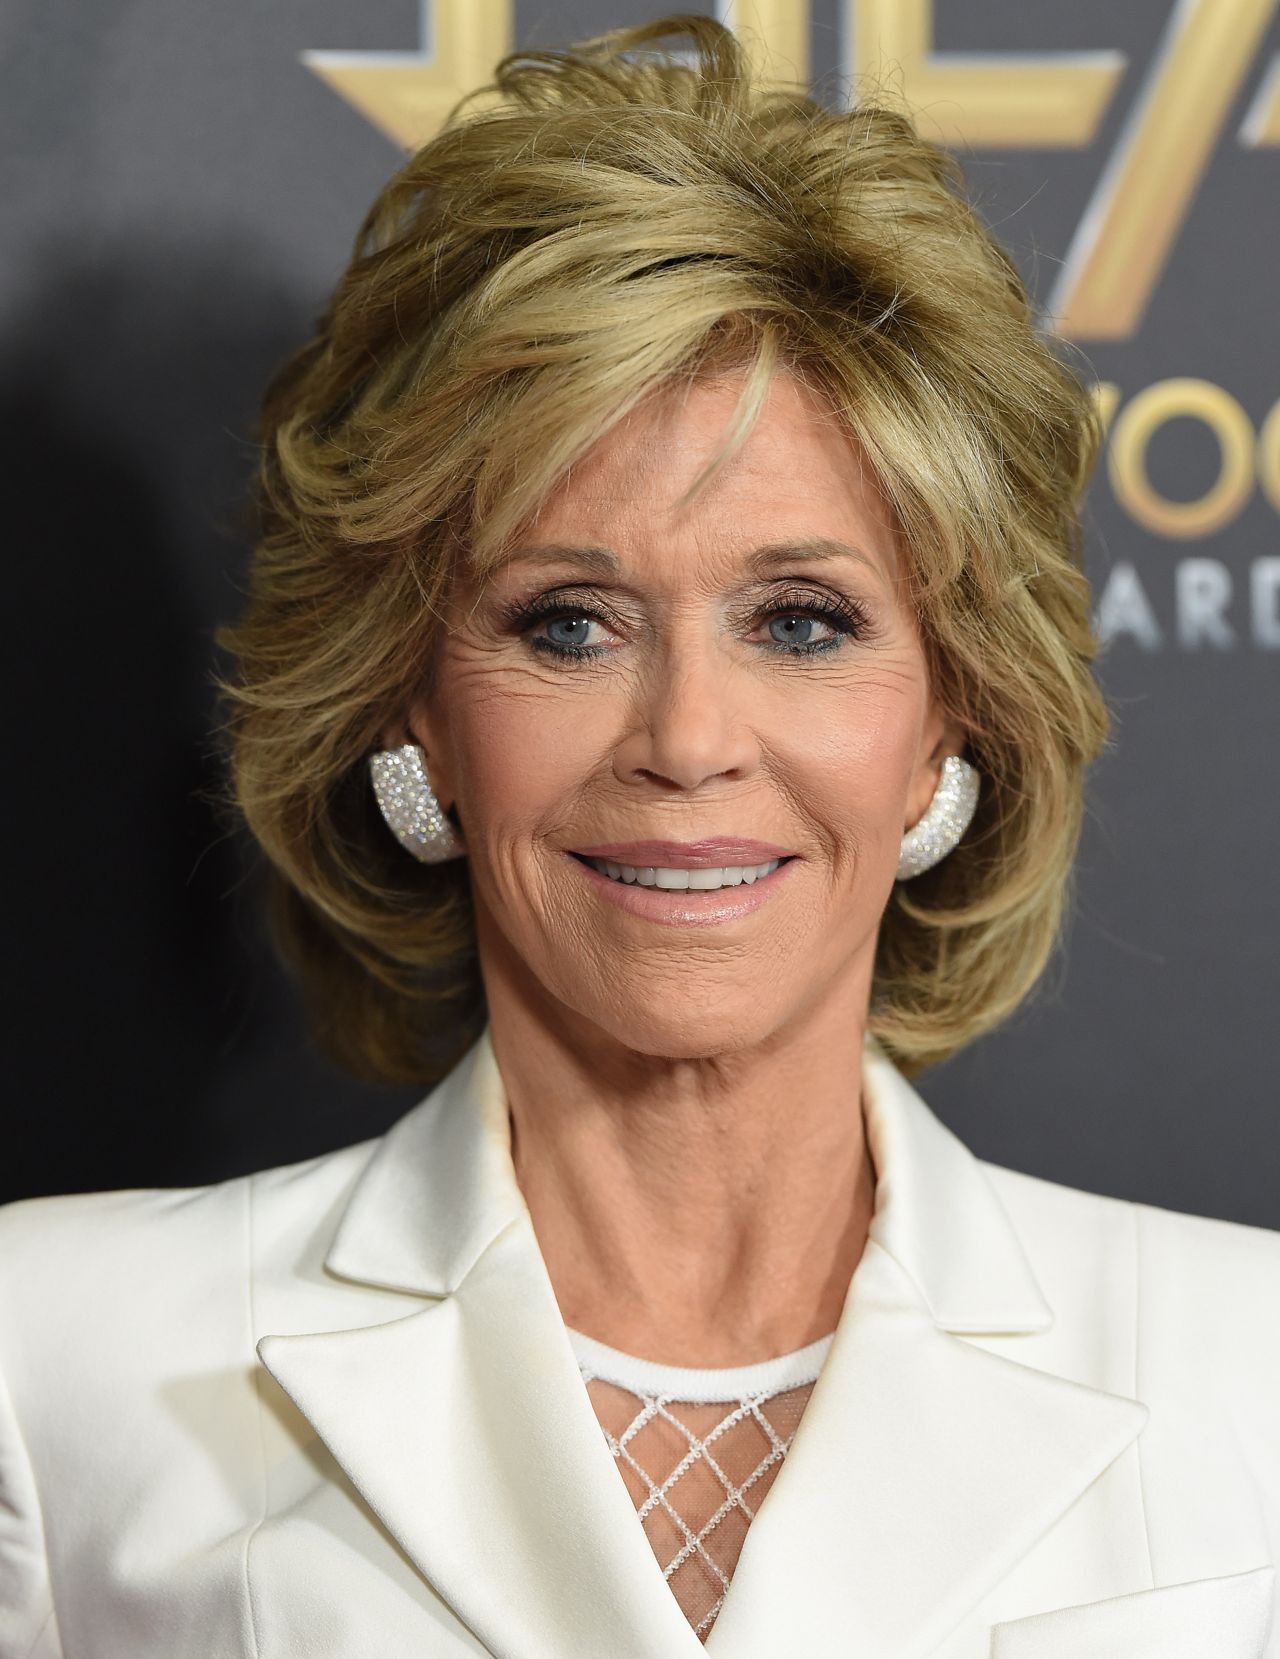 Джейн Фонда фото (Jane Fonda) Jane Fonda photo.